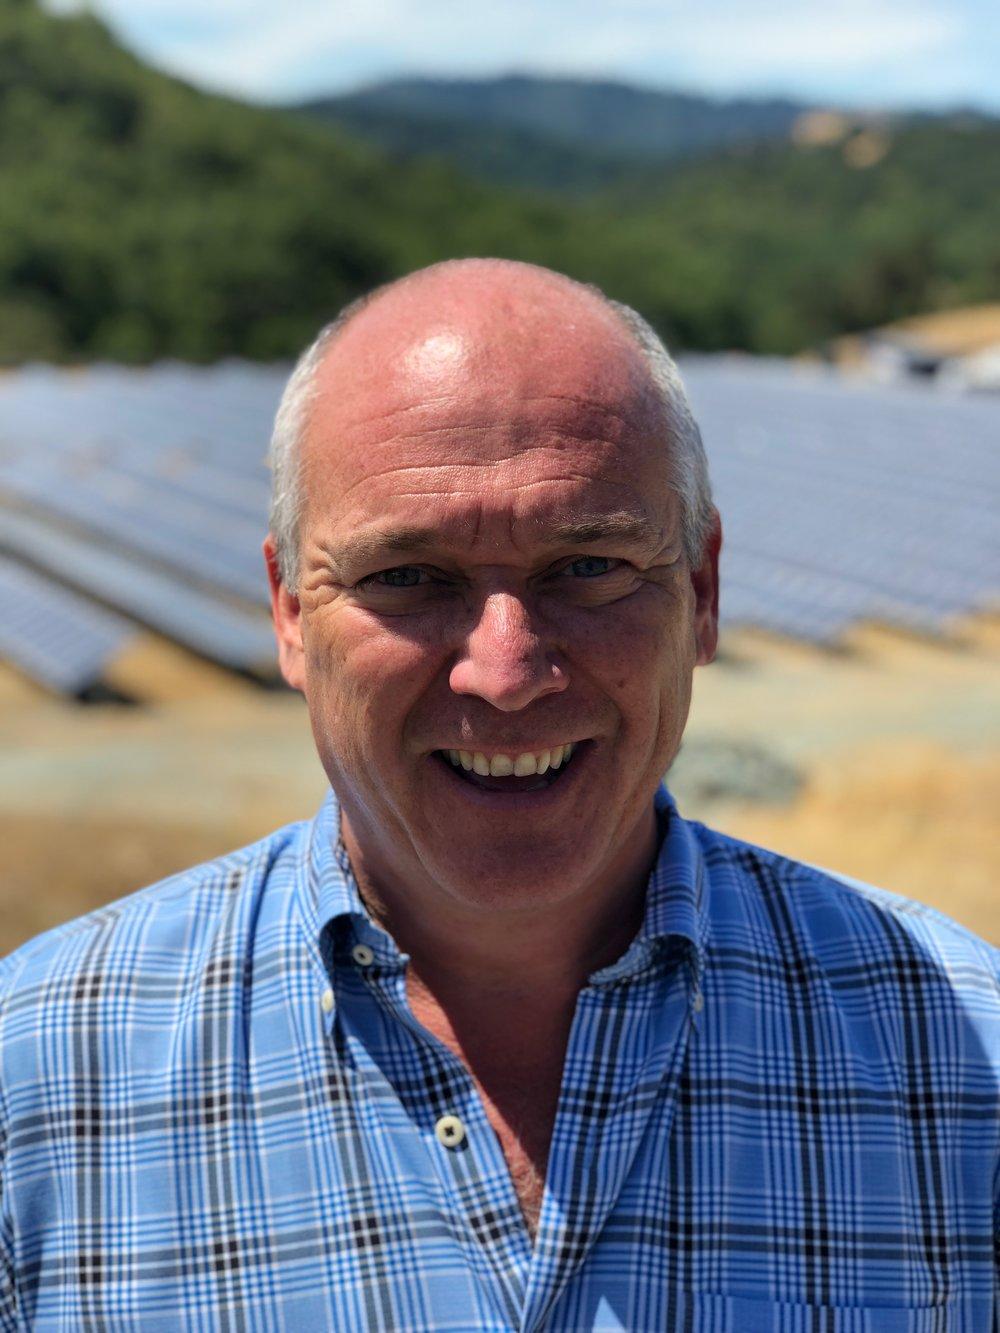 2018-07-13 Gregg at Solar Panels.jpg